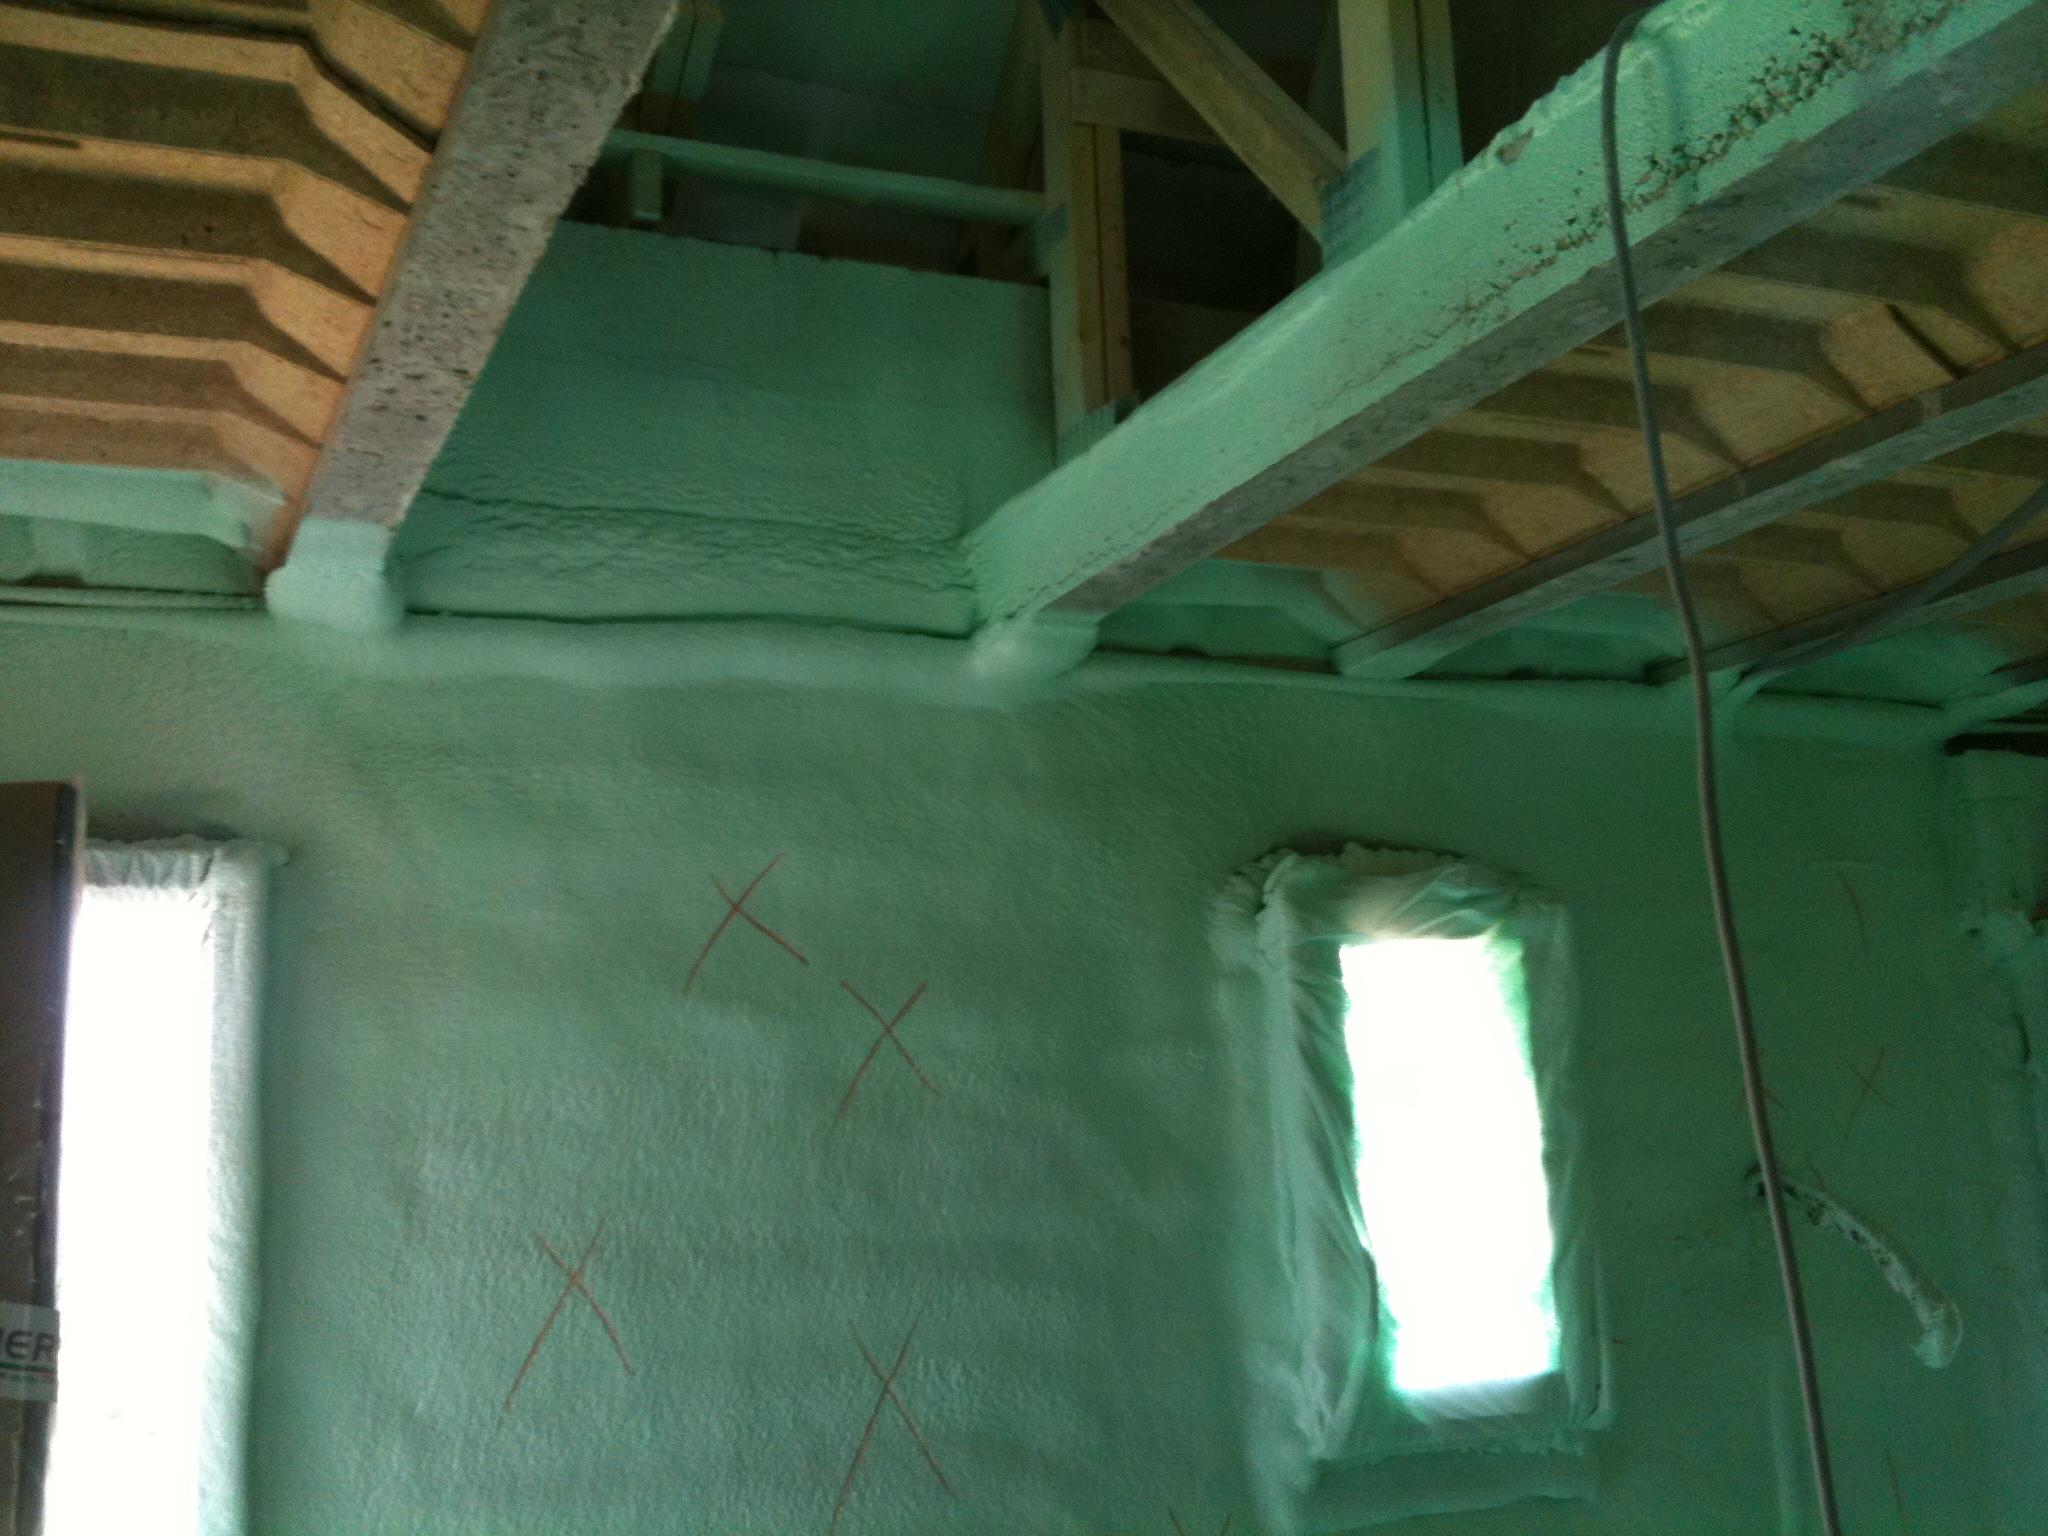 Chantier isolation polyur thane paris isolation projet e mousse polyur than - Isolation mousse polyurethane projetee tarif ...